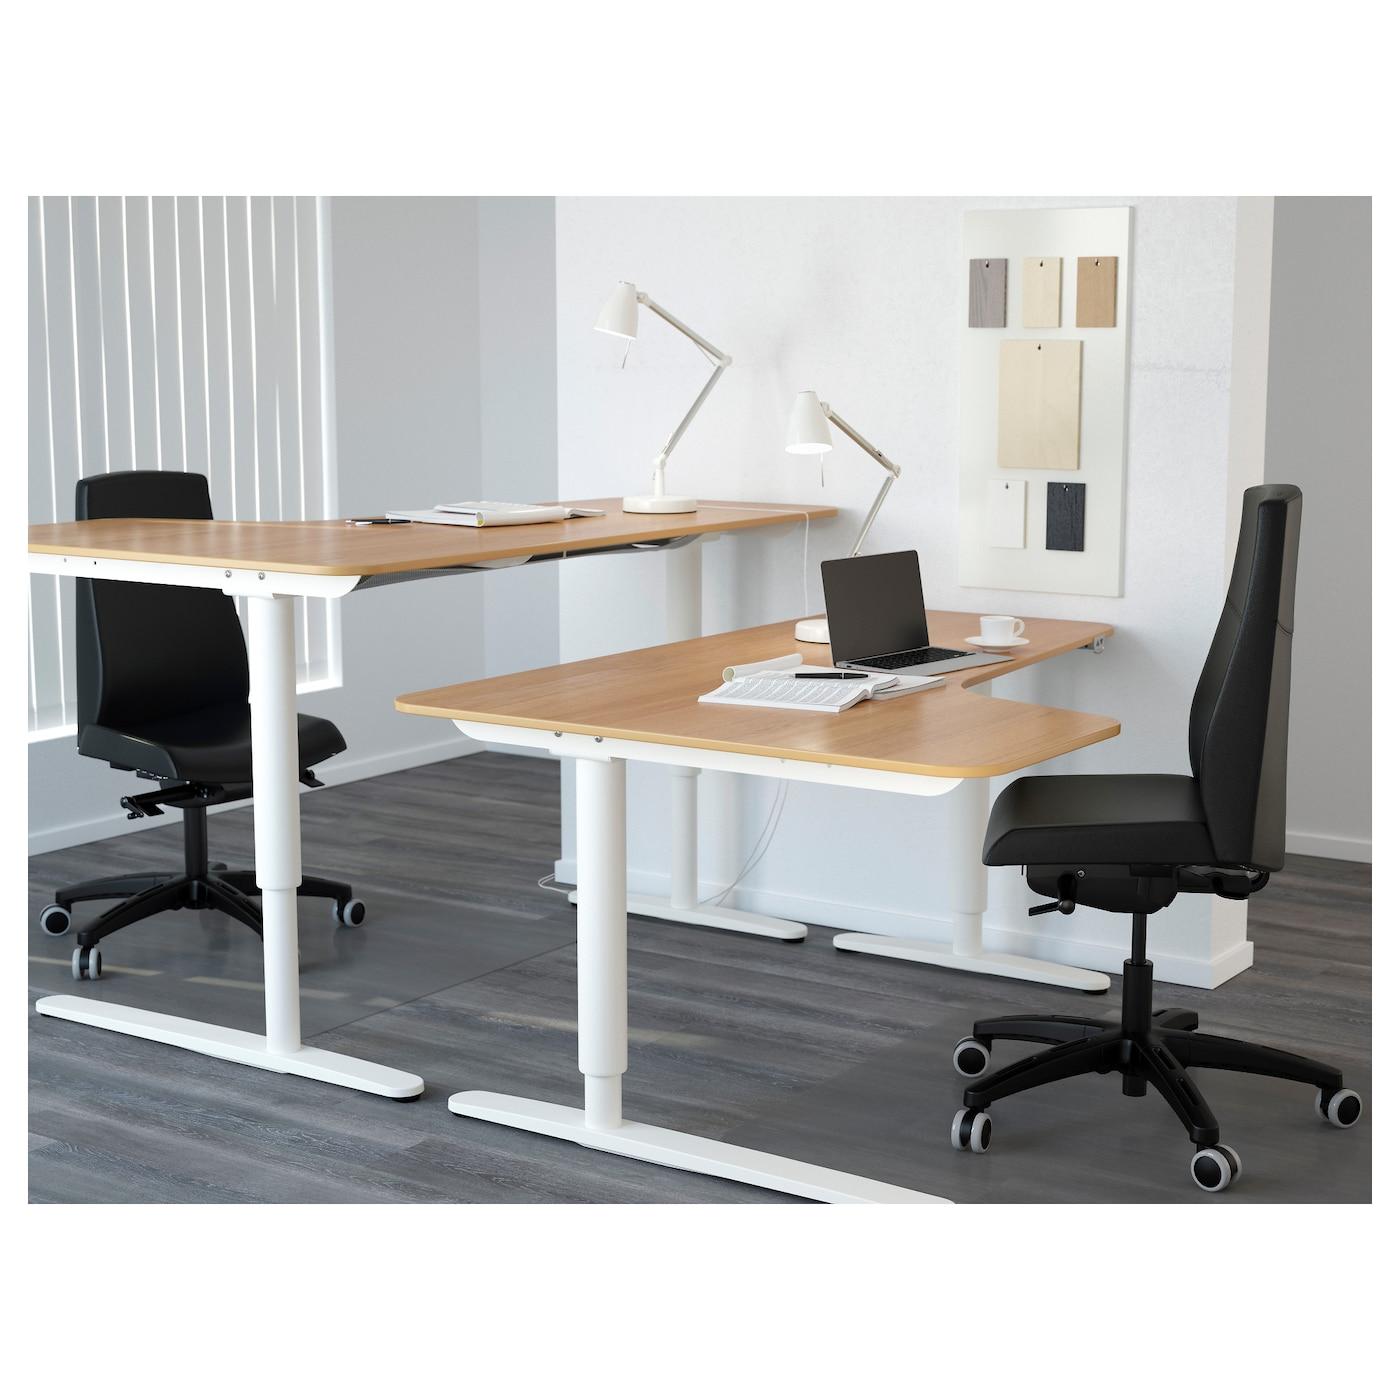 Bekant corner desk left sit stand oak veneer white 160x110 cm ikea - Ikea corner office desk ...